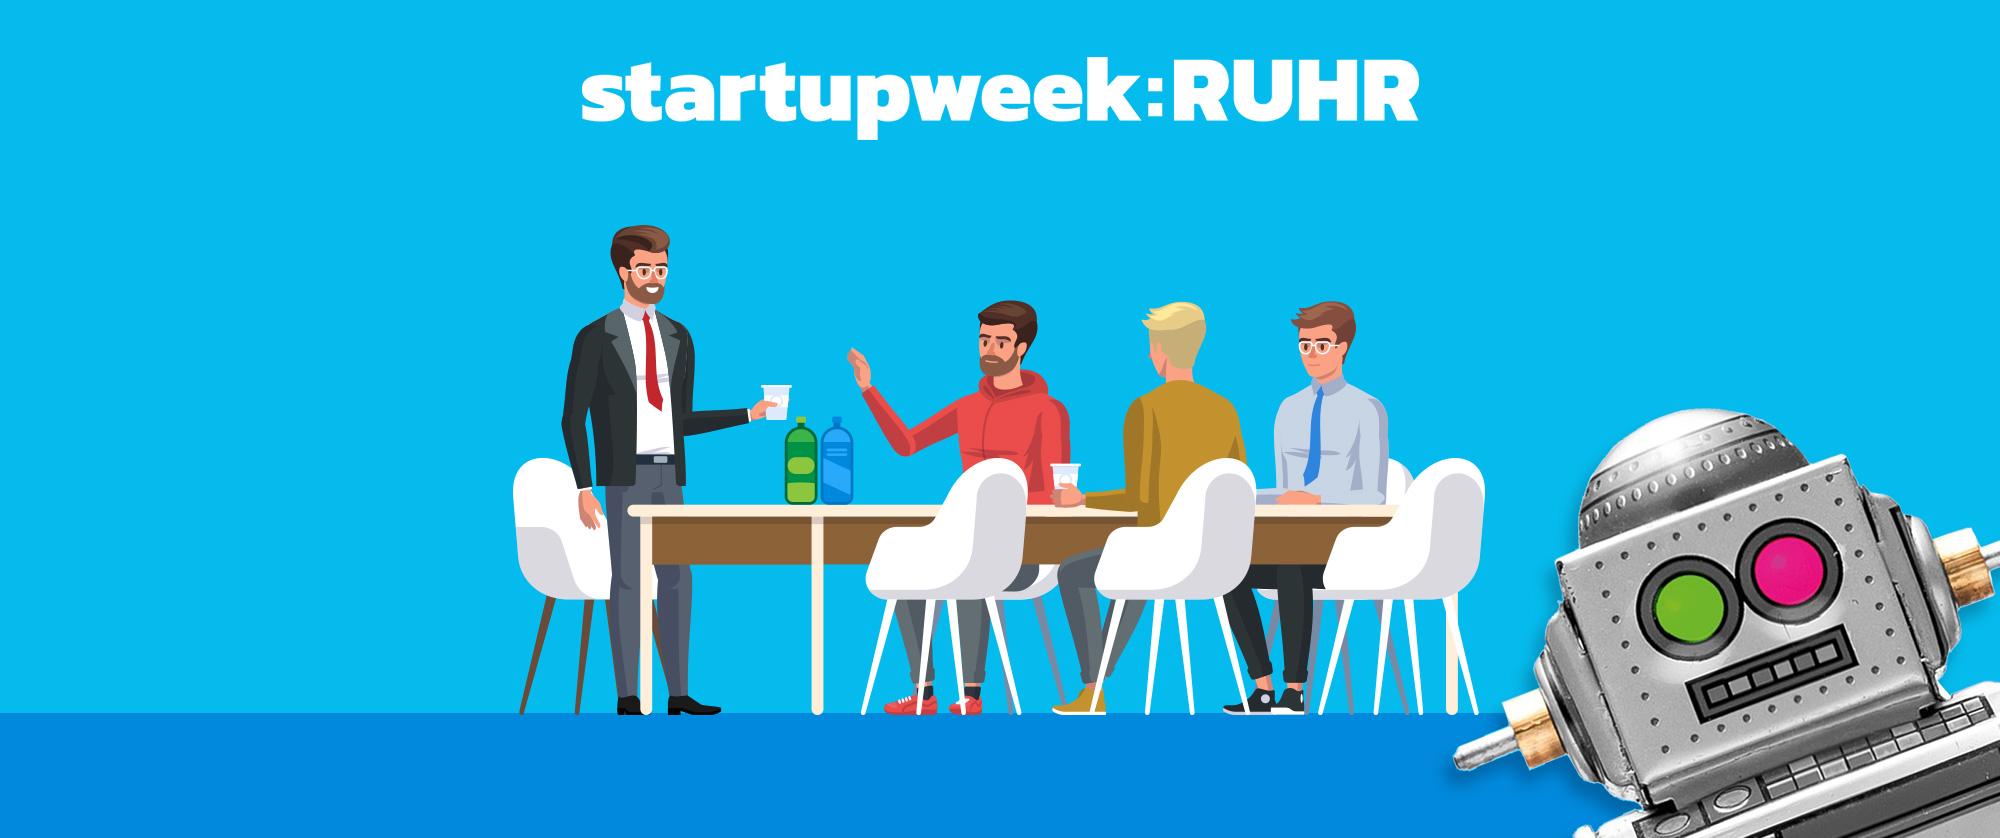 Camp Essen - Startupweek 2018 Kommunikation